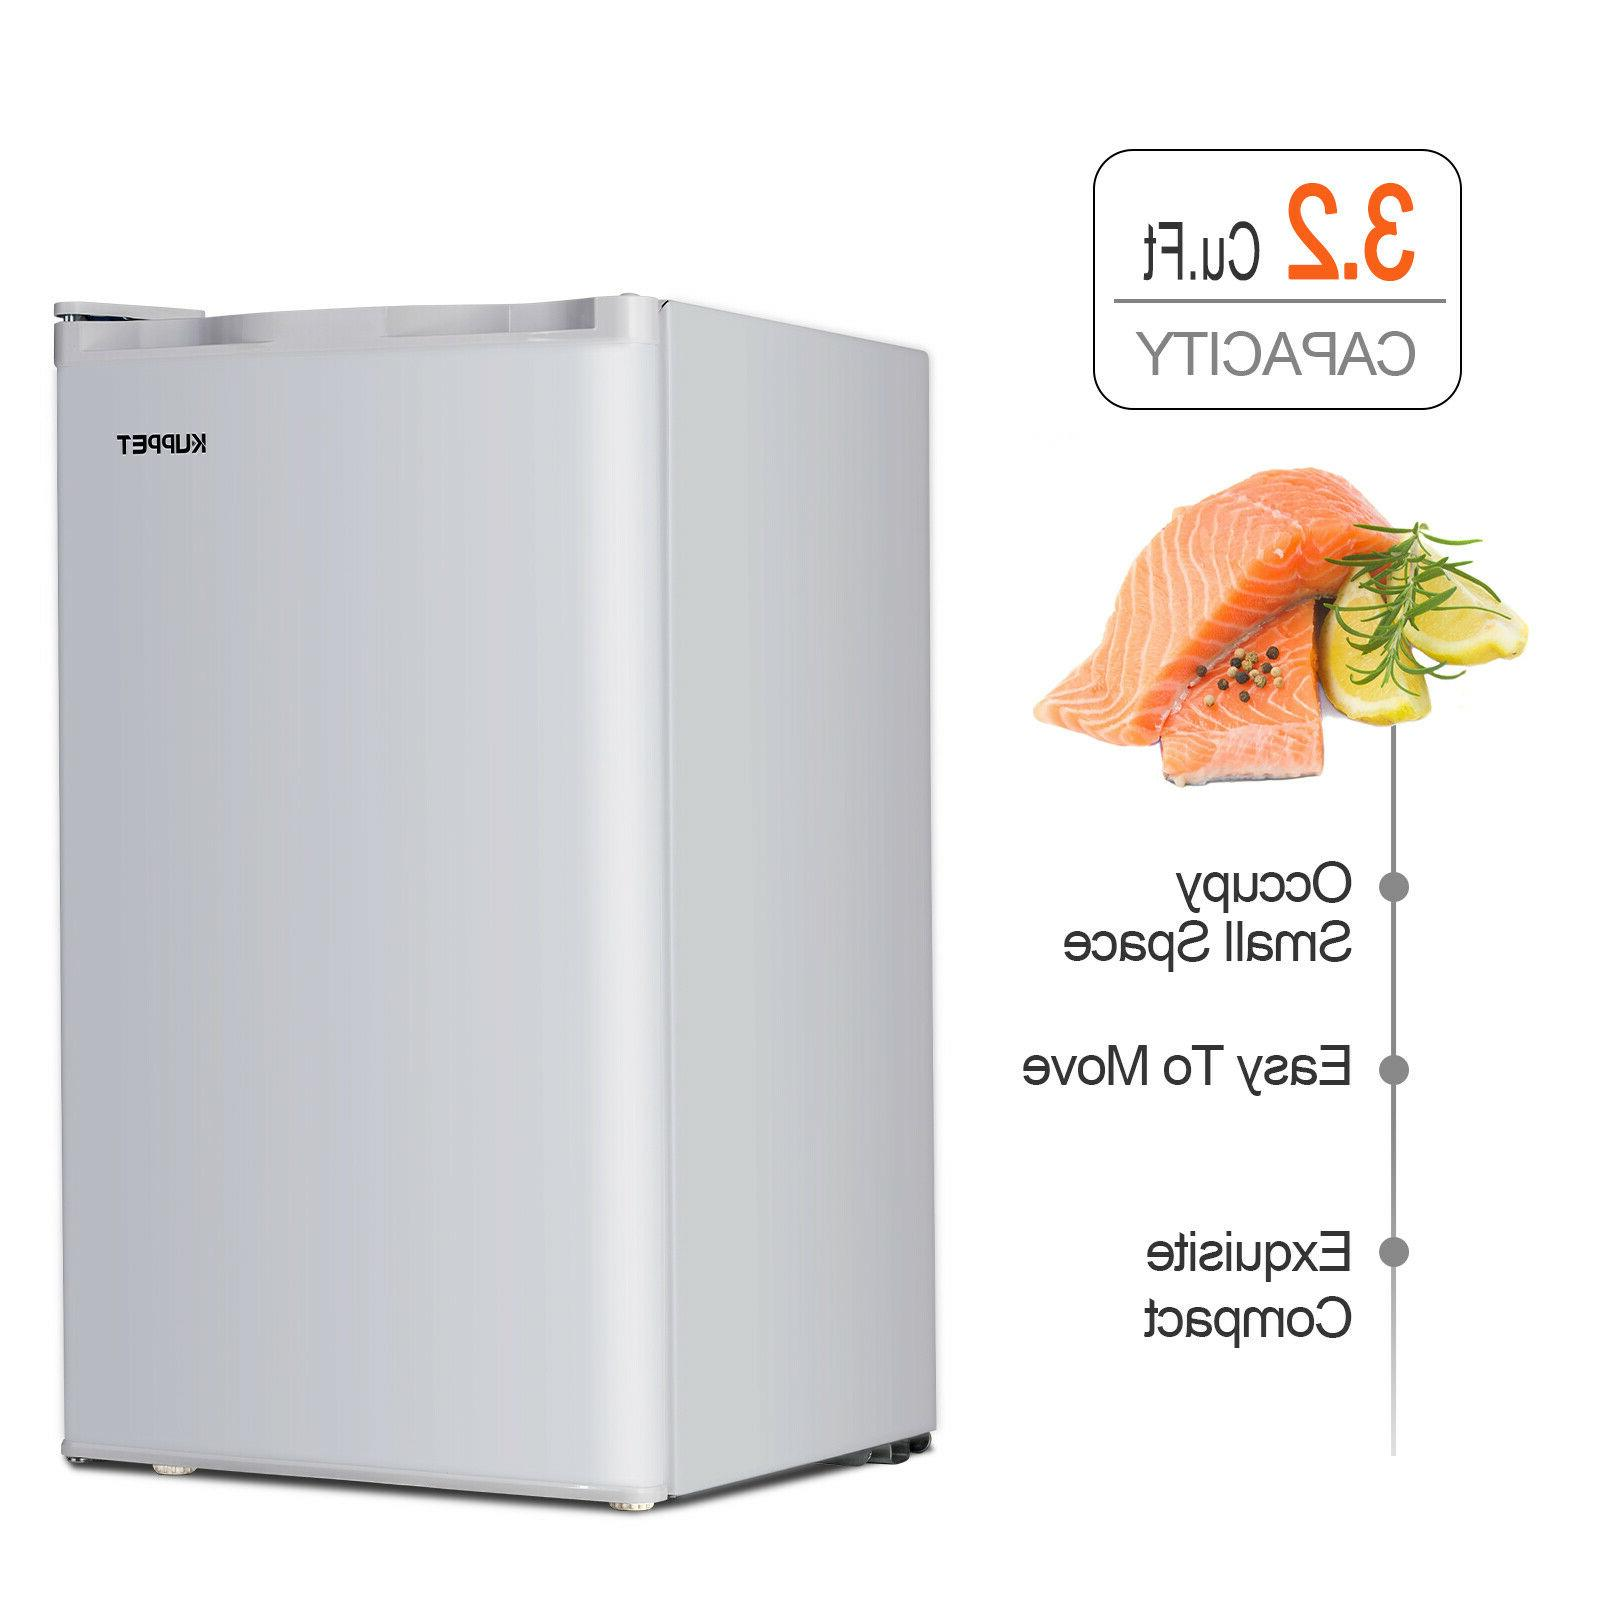 Compact Refrigerator Mini Home Dorm Appliances 3.2 Cu.ft White